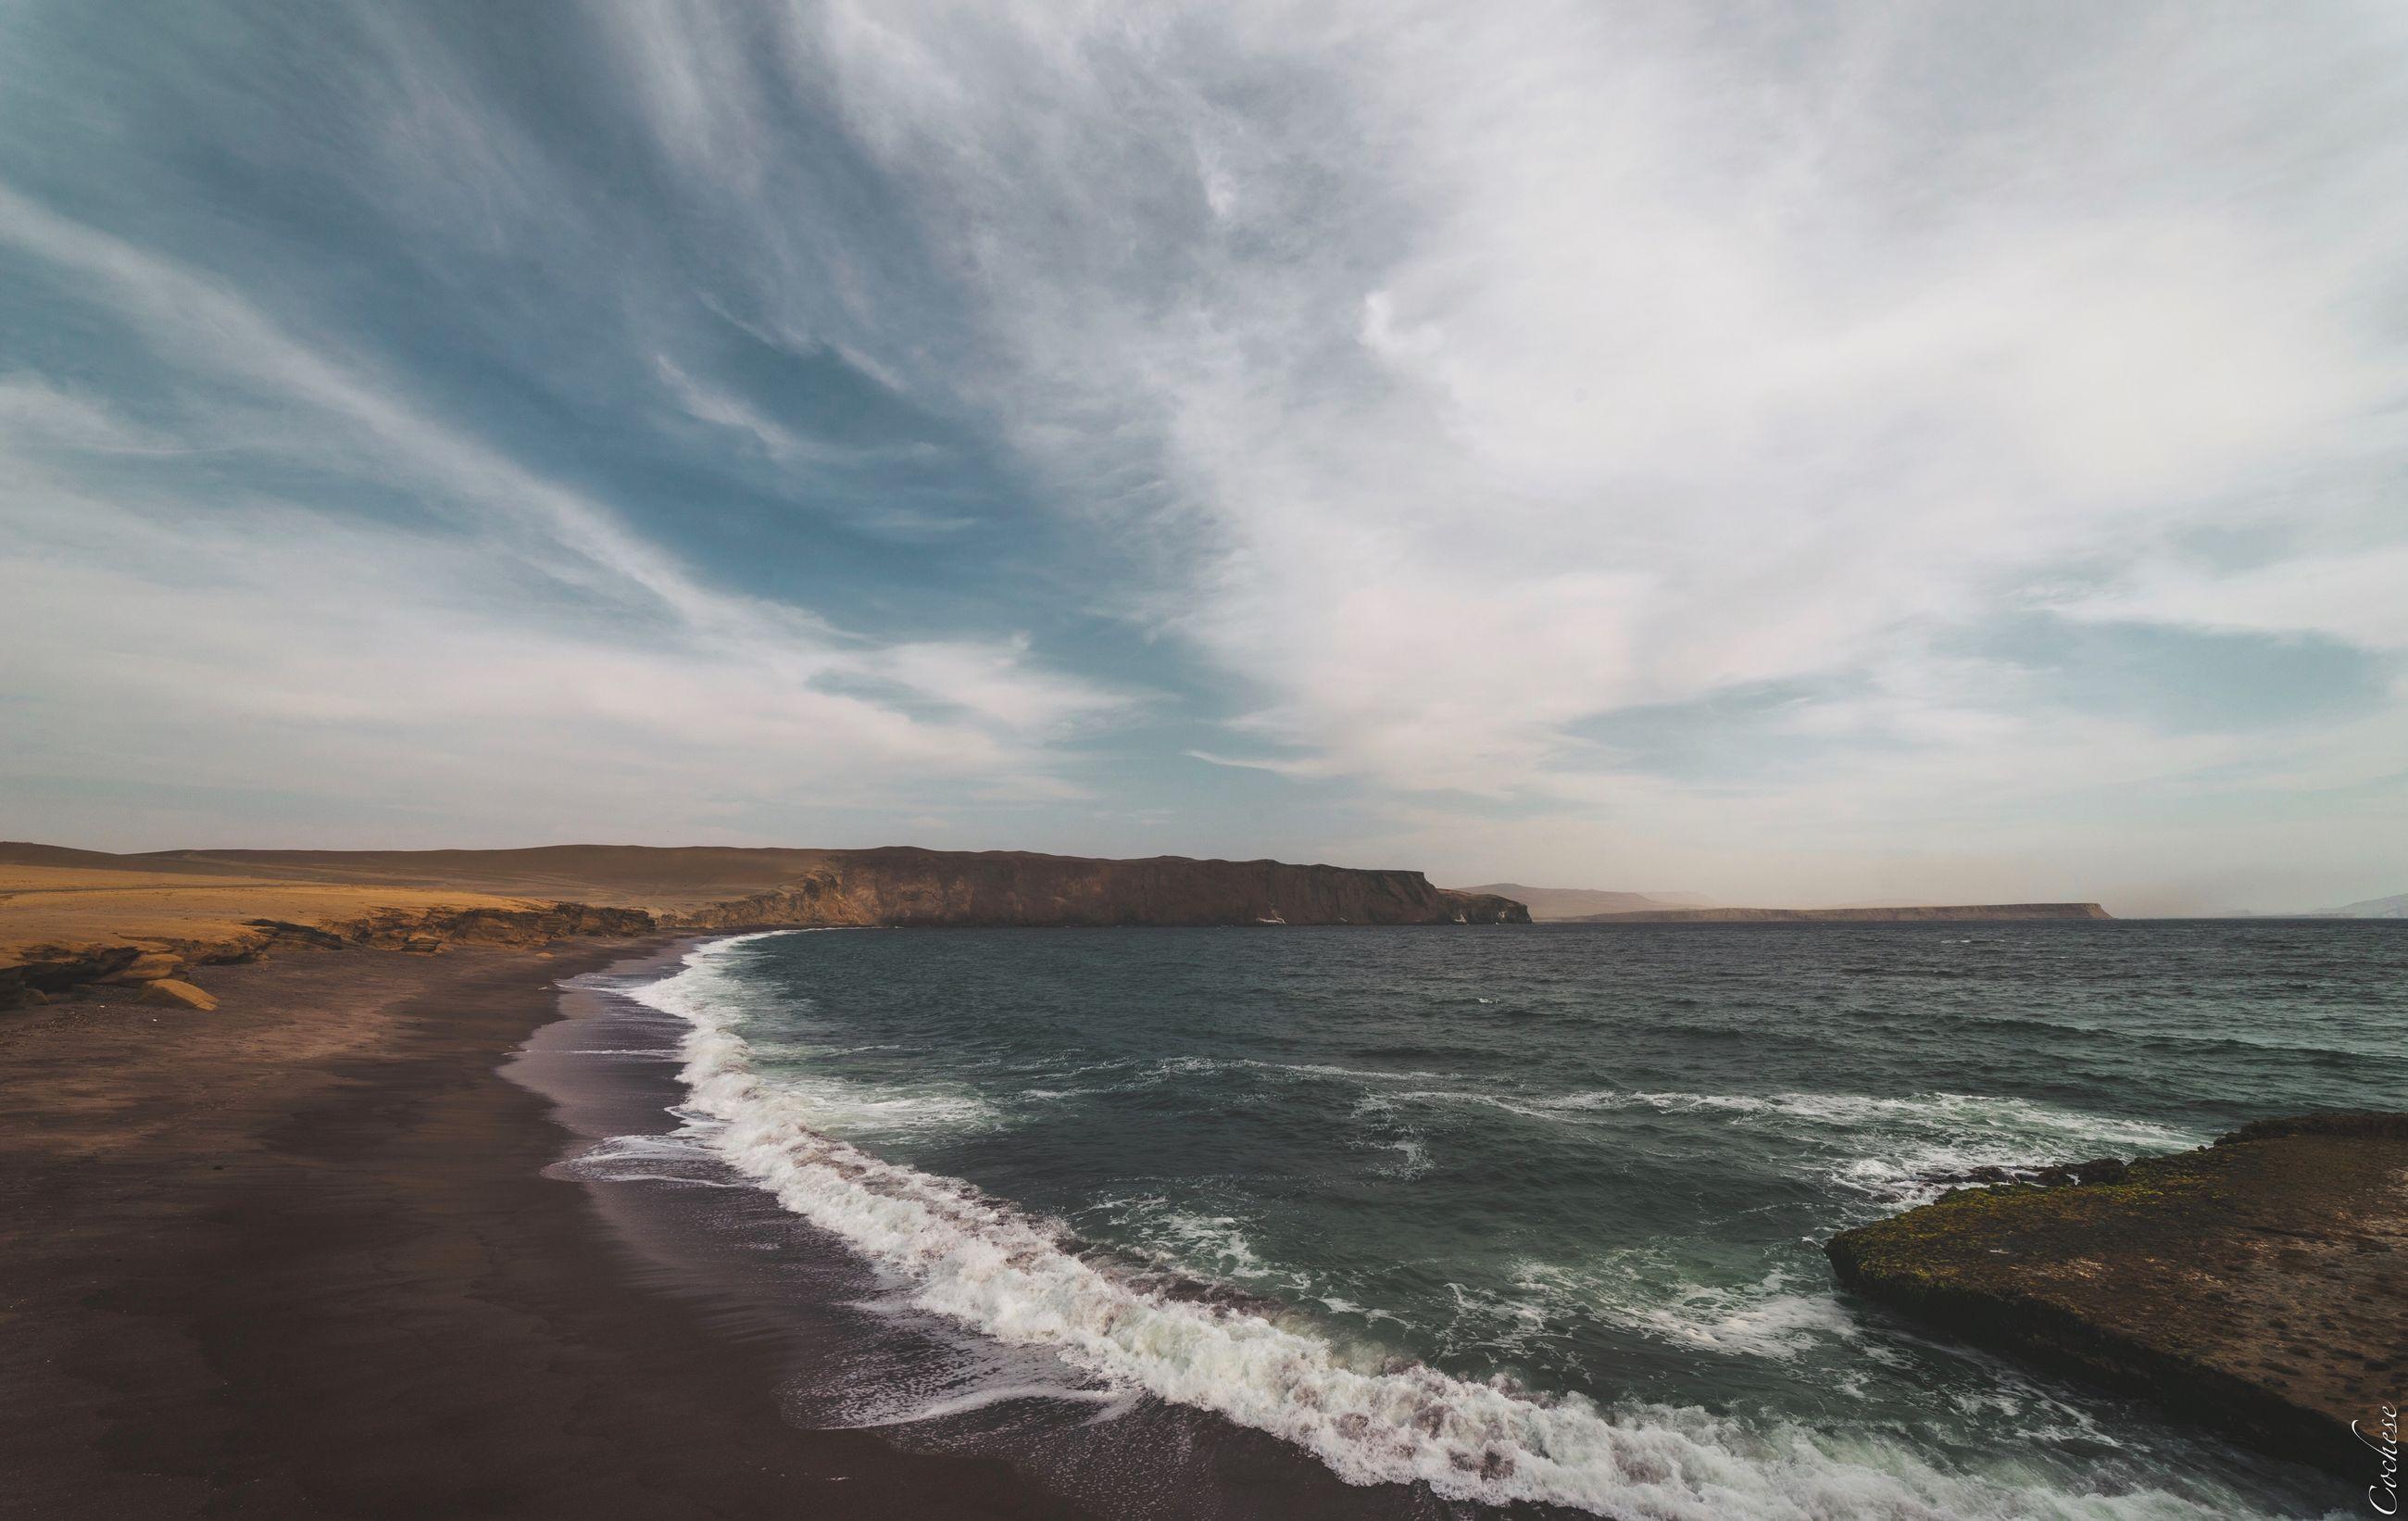 sea, water, sky, beach, beauty in nature, scenics - nature, land, cloud - sky, wave, sport, motion, aquatic sport, surfing, nature, horizon, horizon over water, tranquil scene, non-urban scene, outdoors